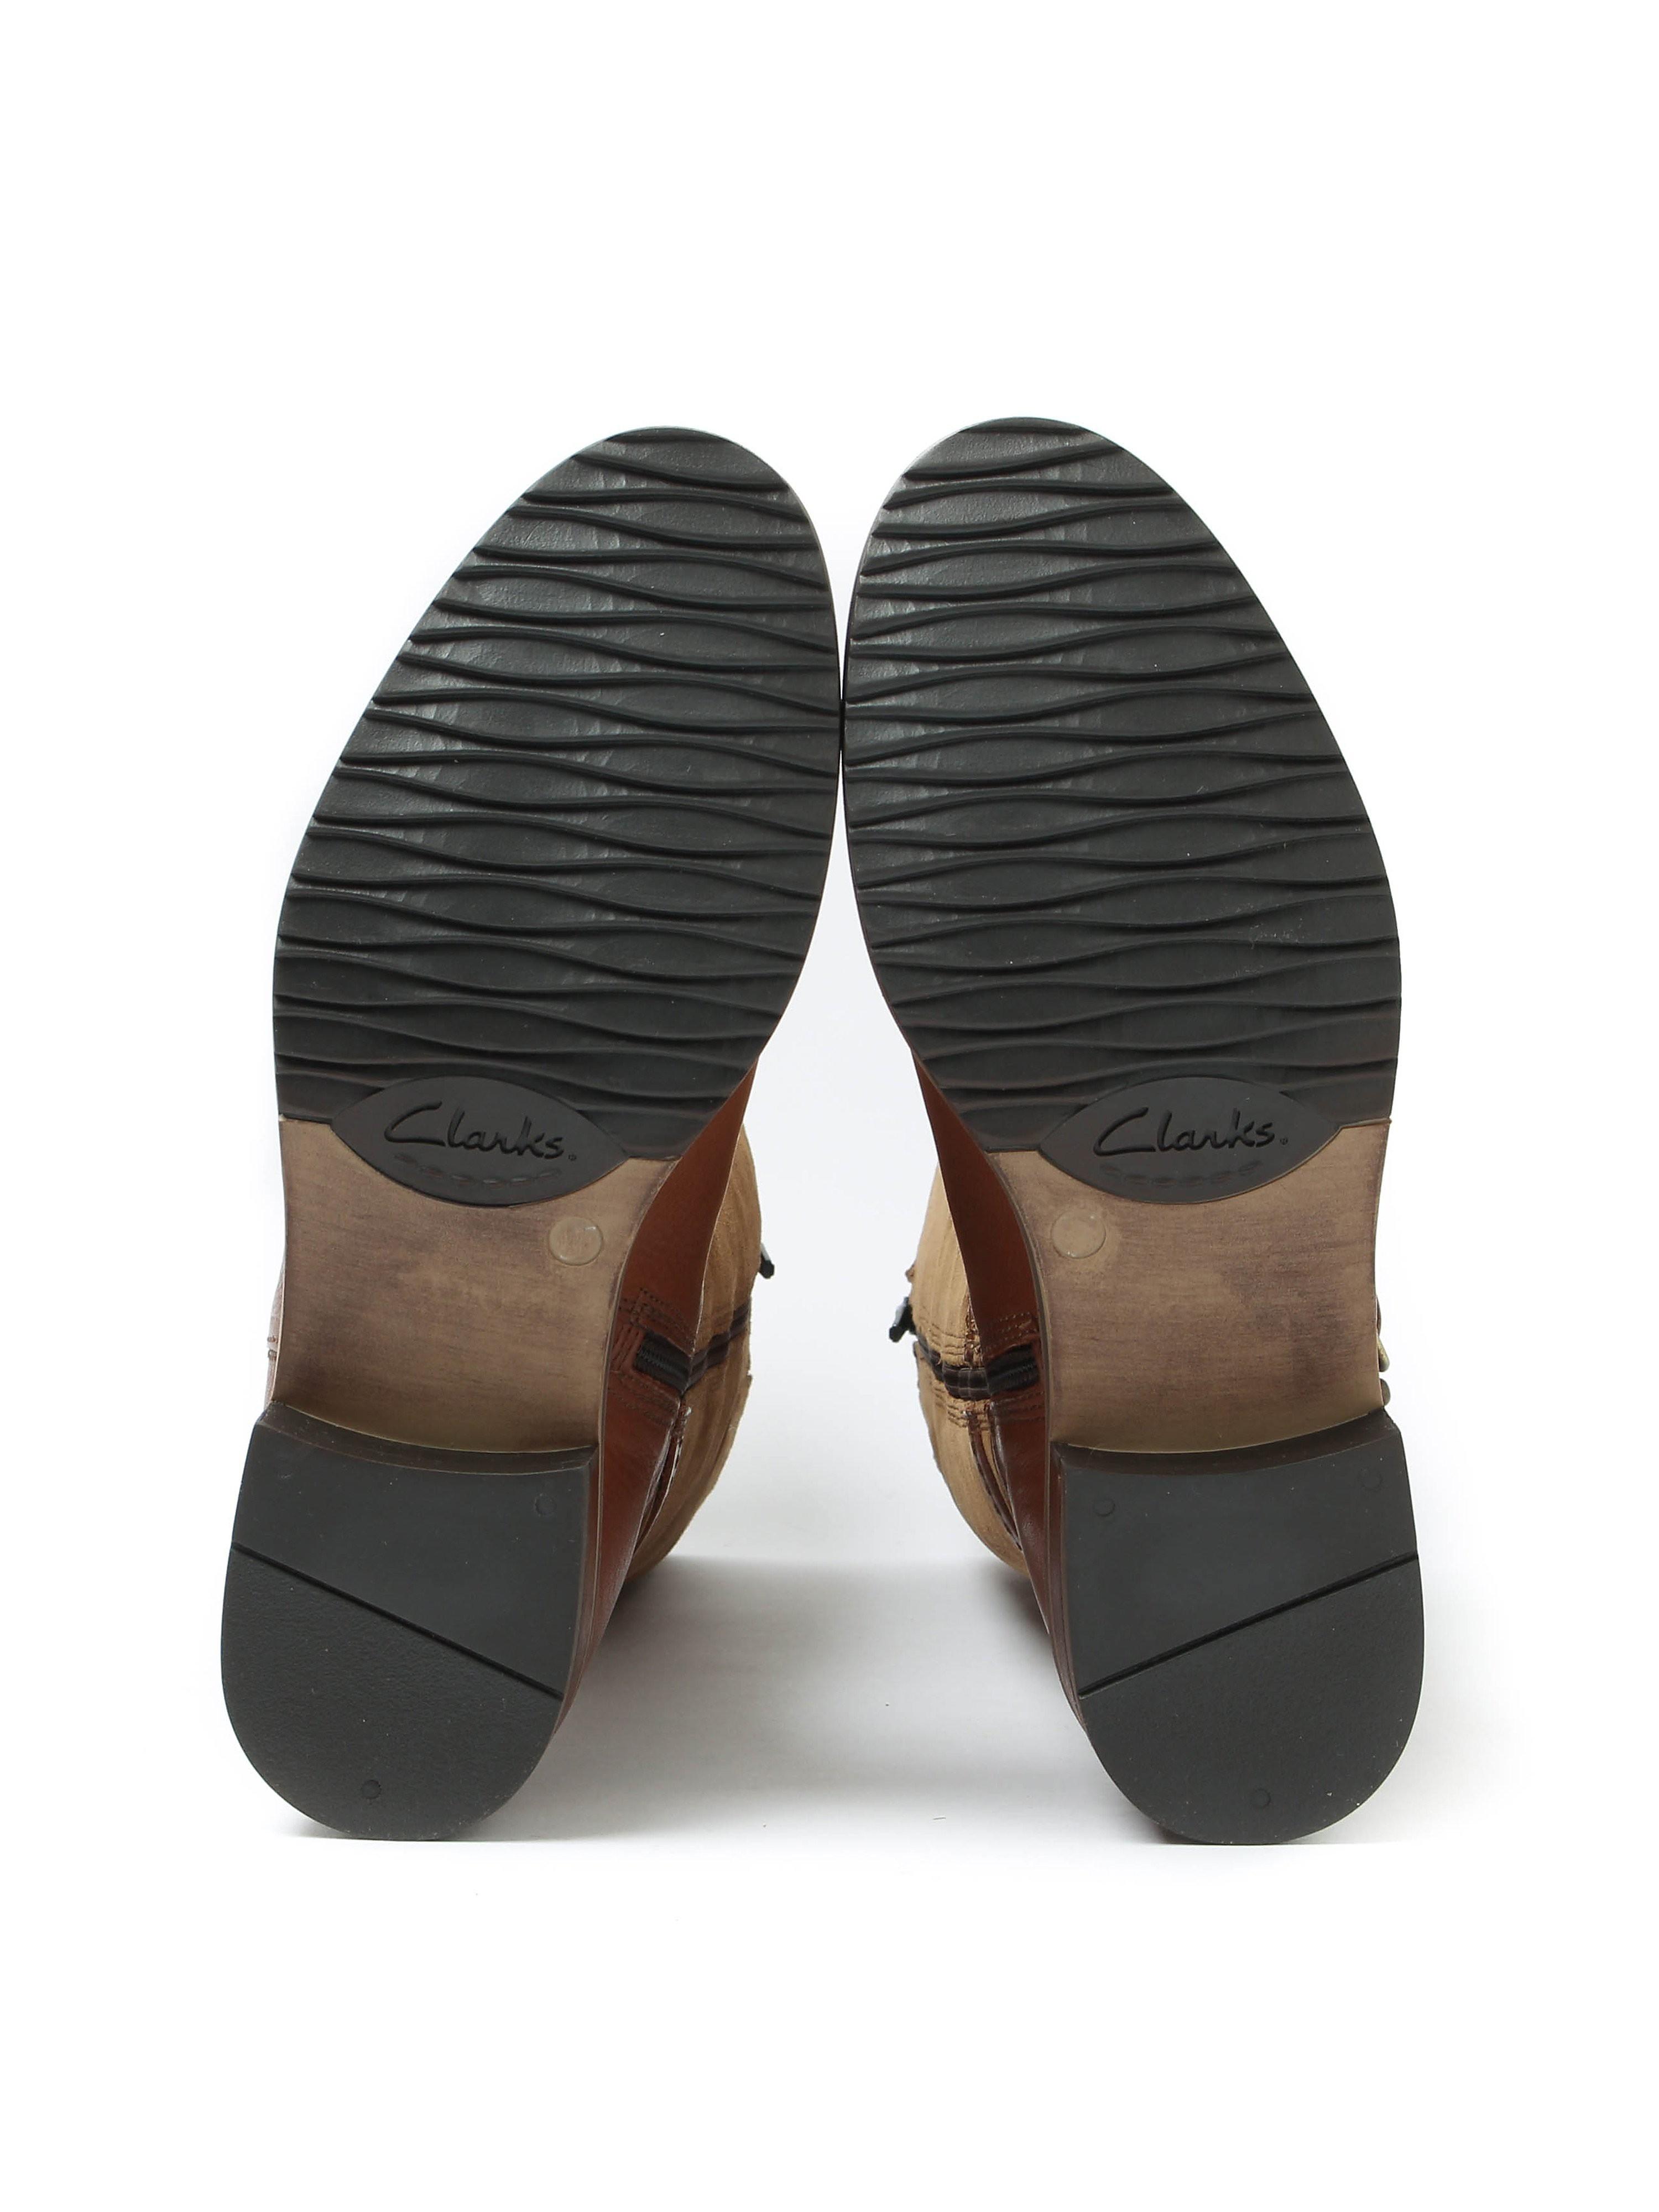 Clarks Women's Tamro Marina Boots - Brown